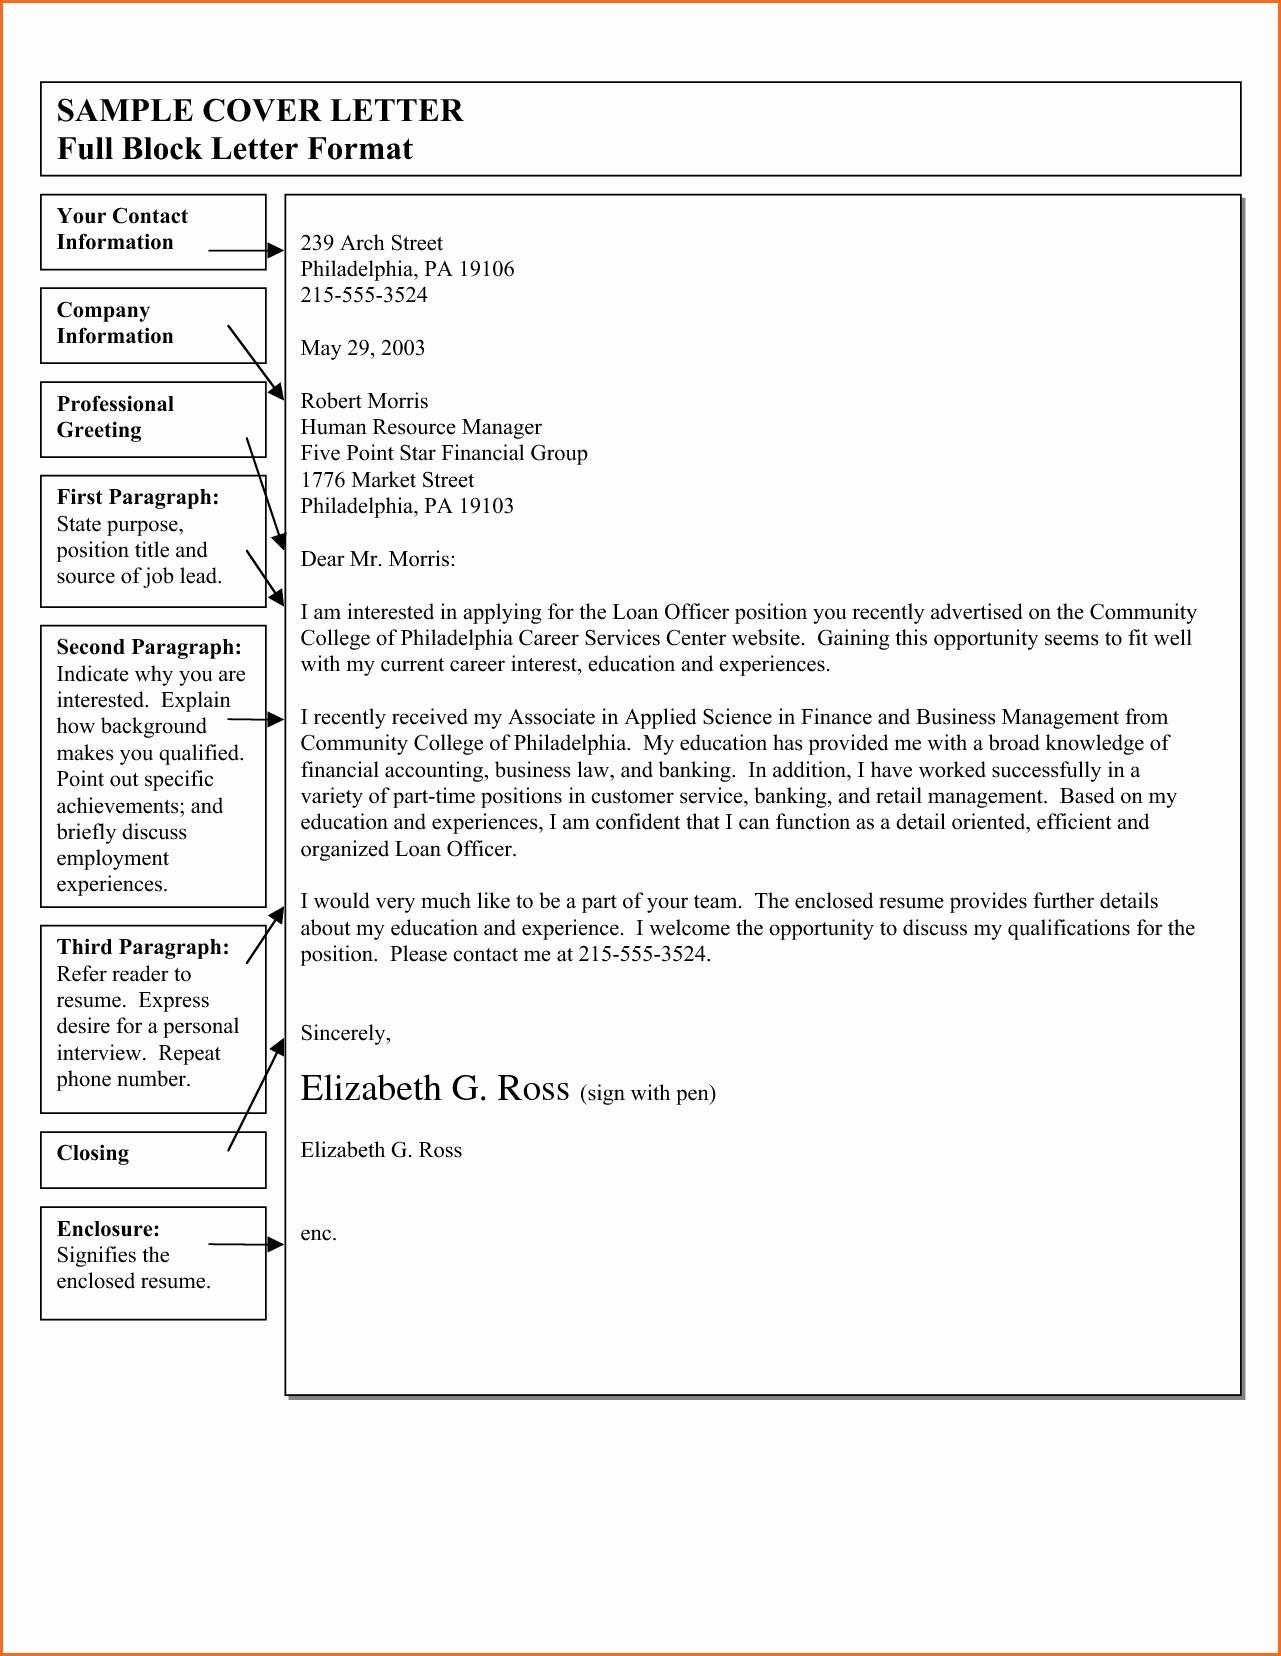 Formal Business Letter format Template Fresh Block format Business Letter Template